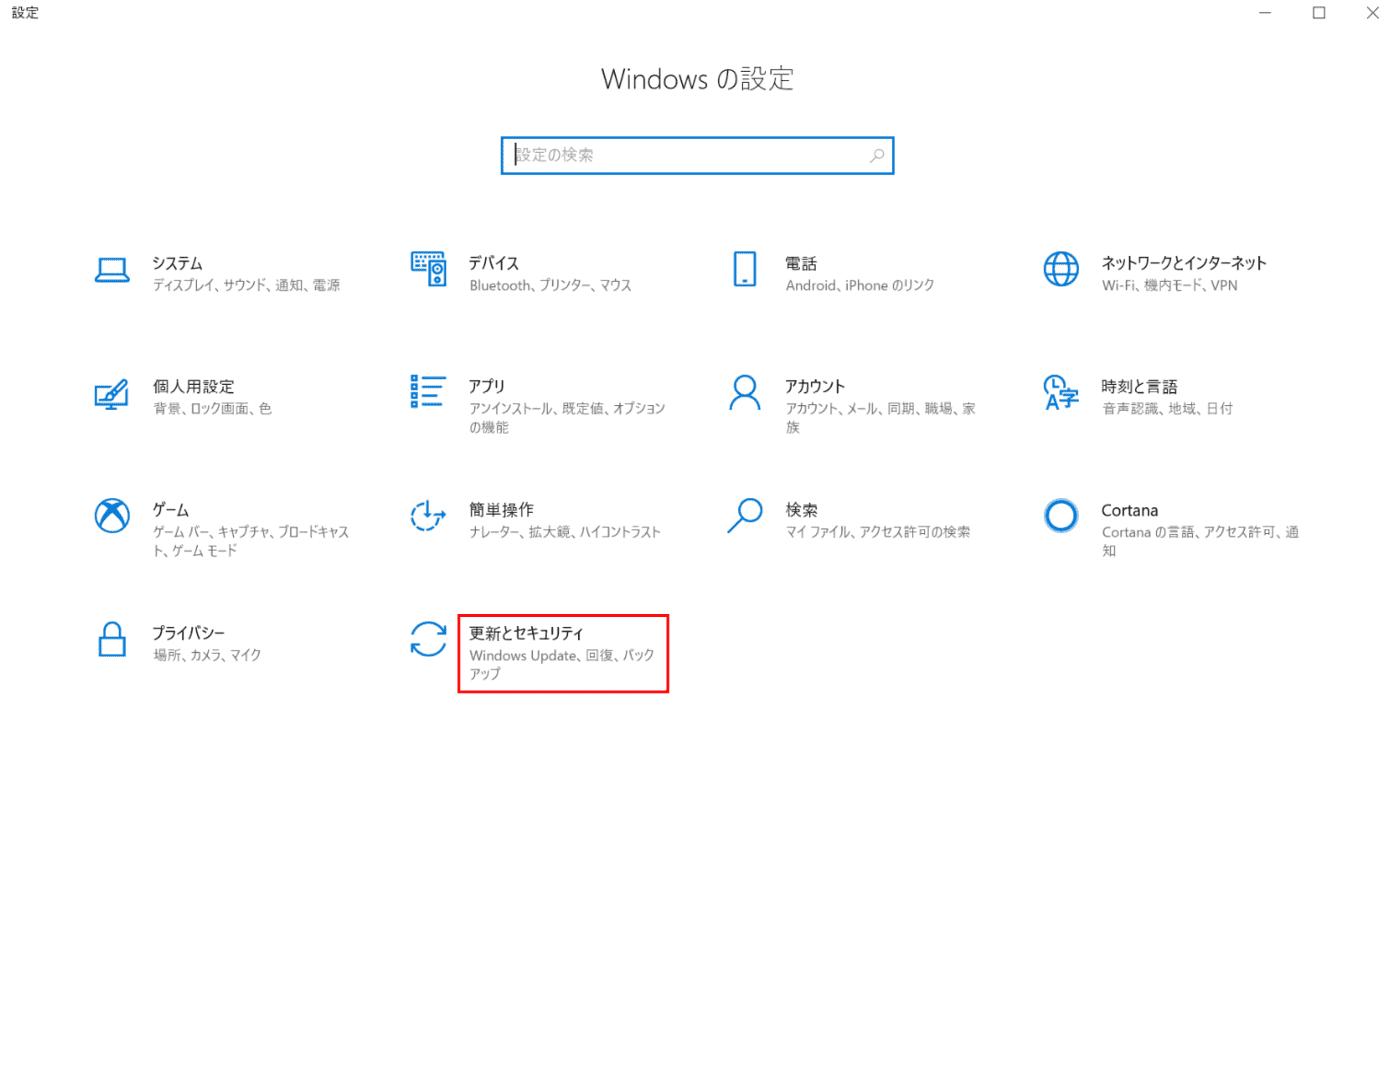 Windowsの設定から更新とセキュリティを選択